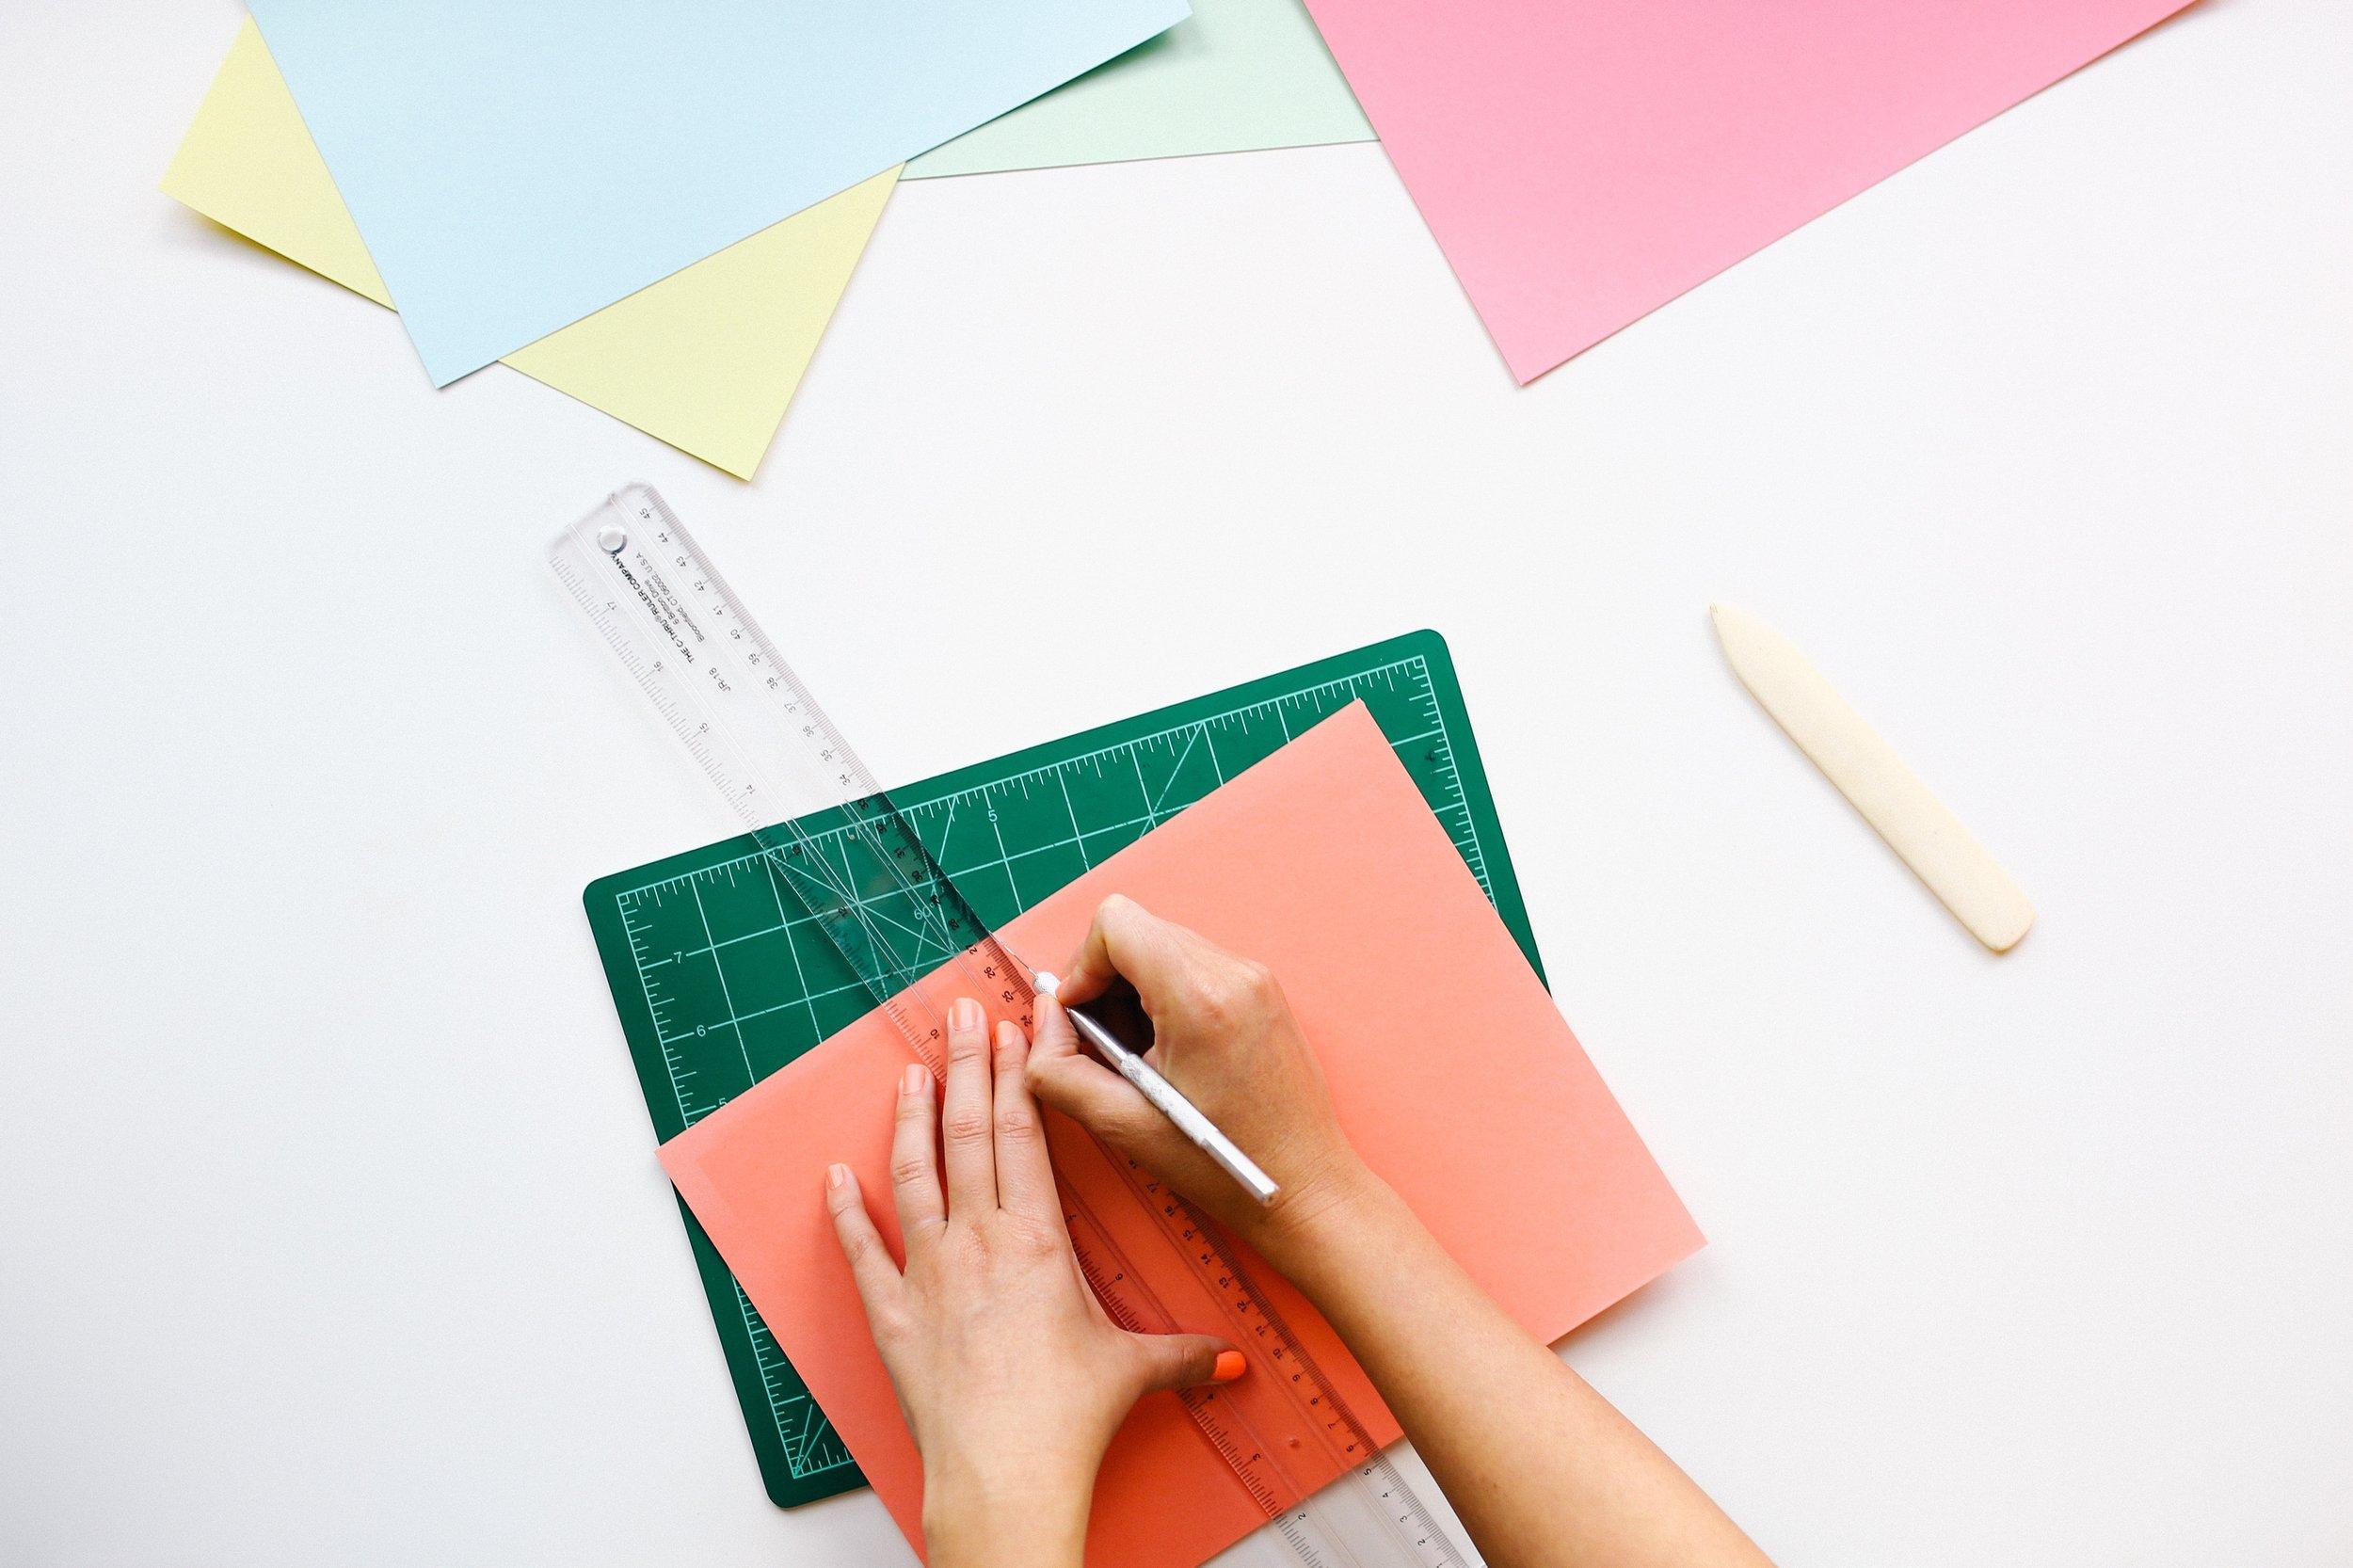 career-planning-tips.jpg